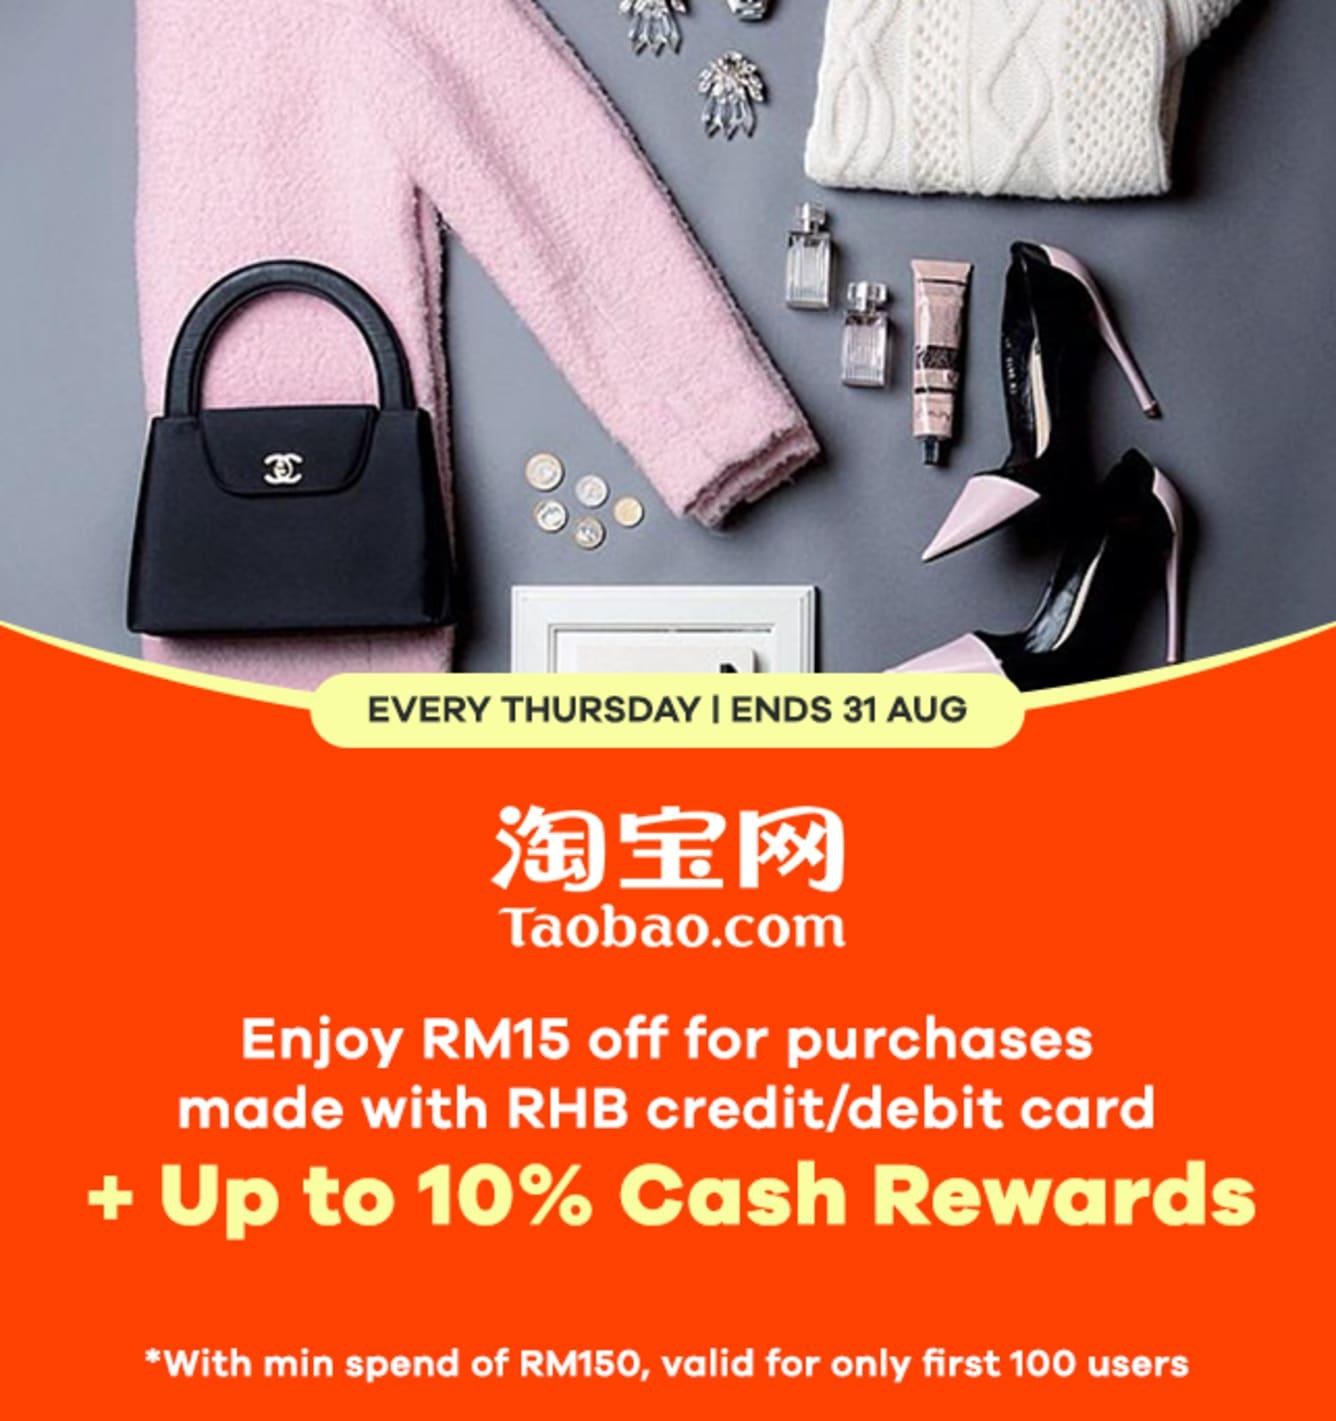 Taobao: Up to 30% Cashback